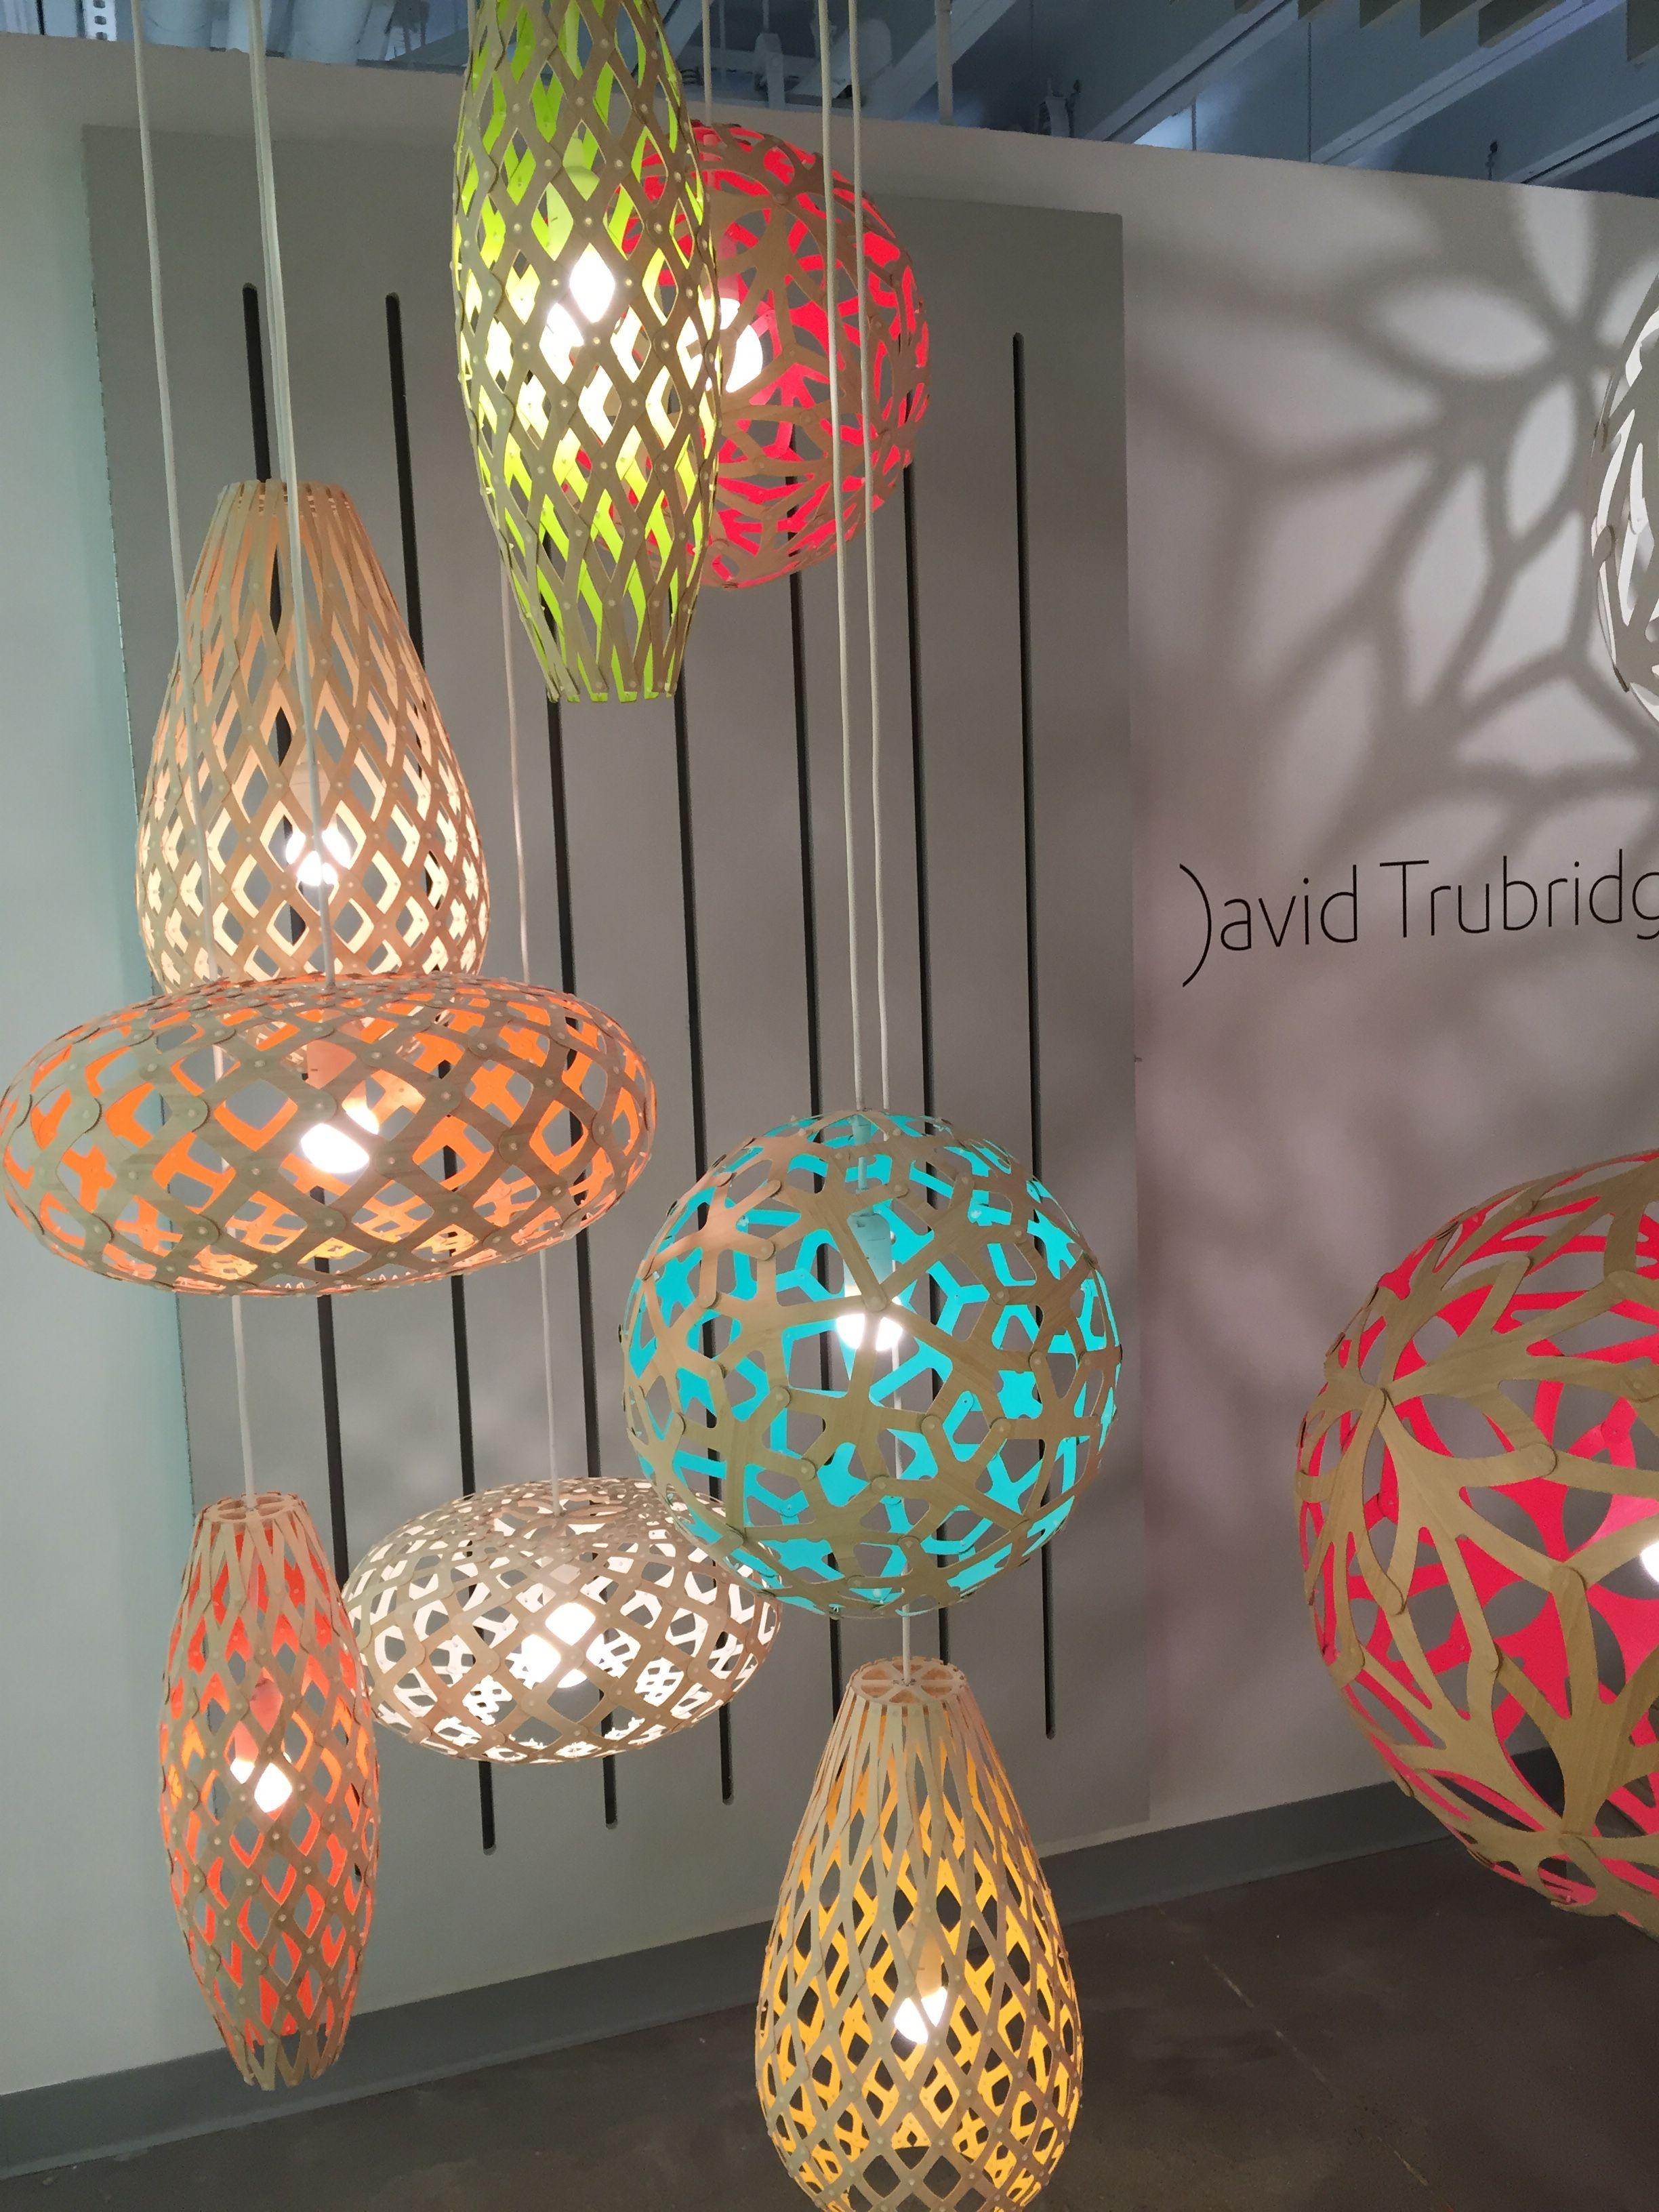 David Trubridge Lighting At The Dallas International Lighting